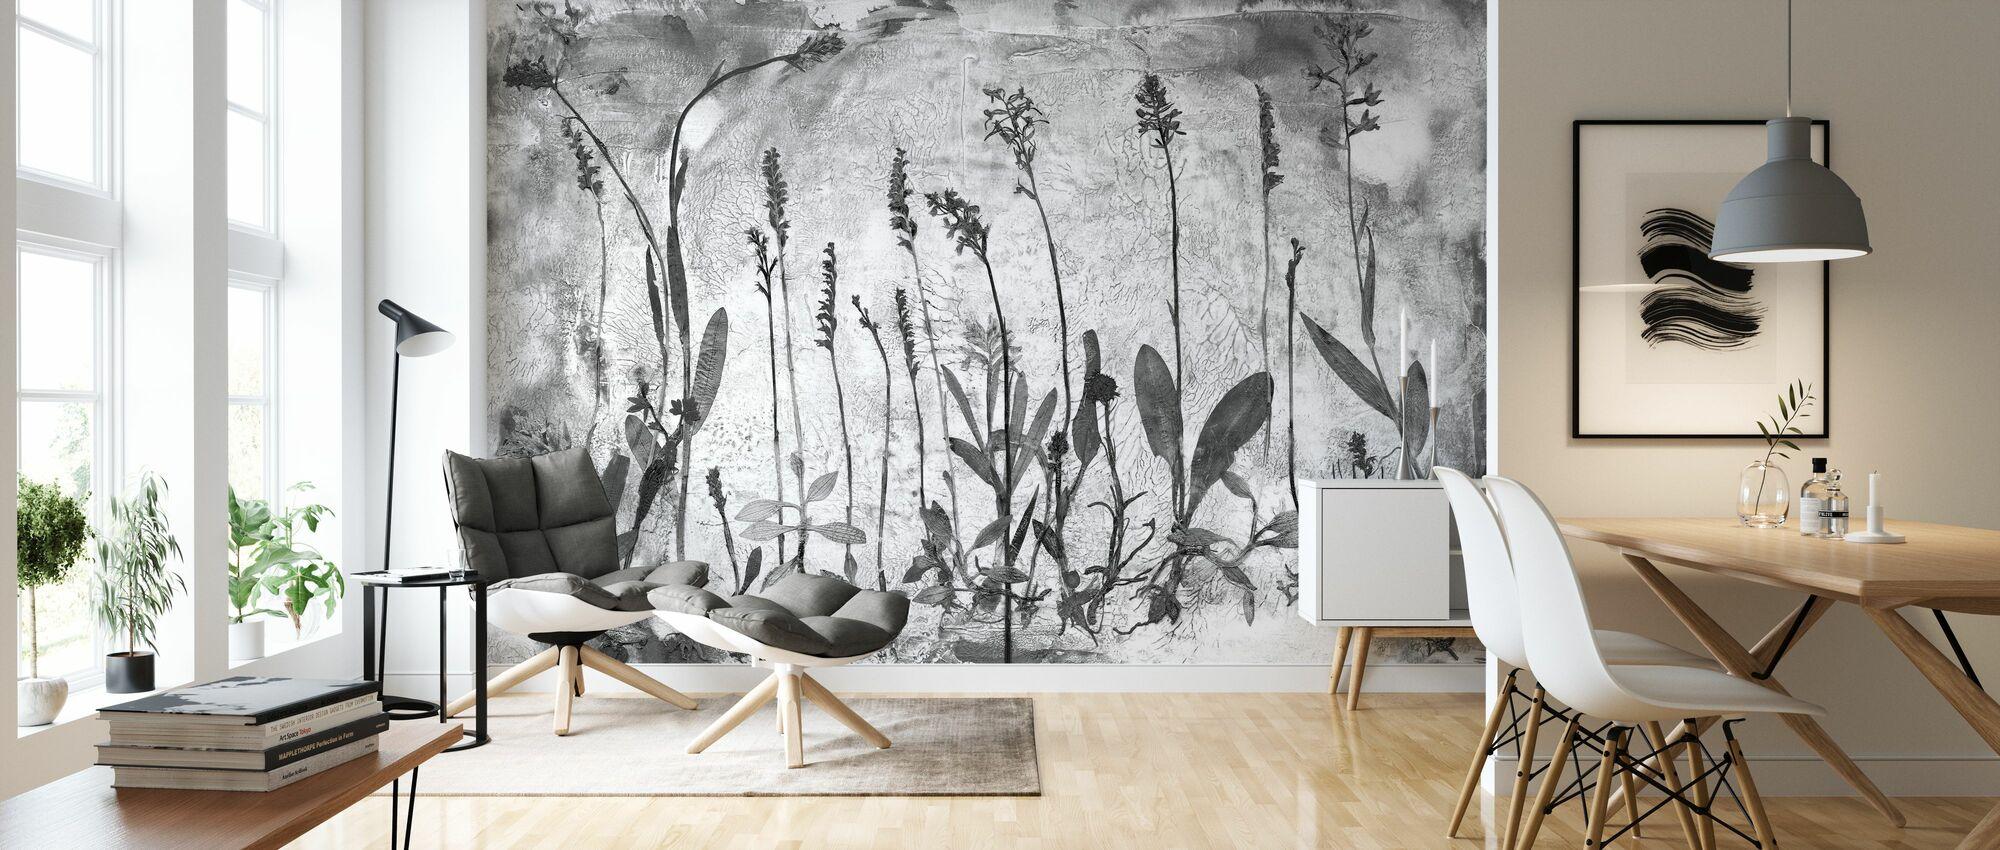 Orchidaceae - Wallpaper - Living Room